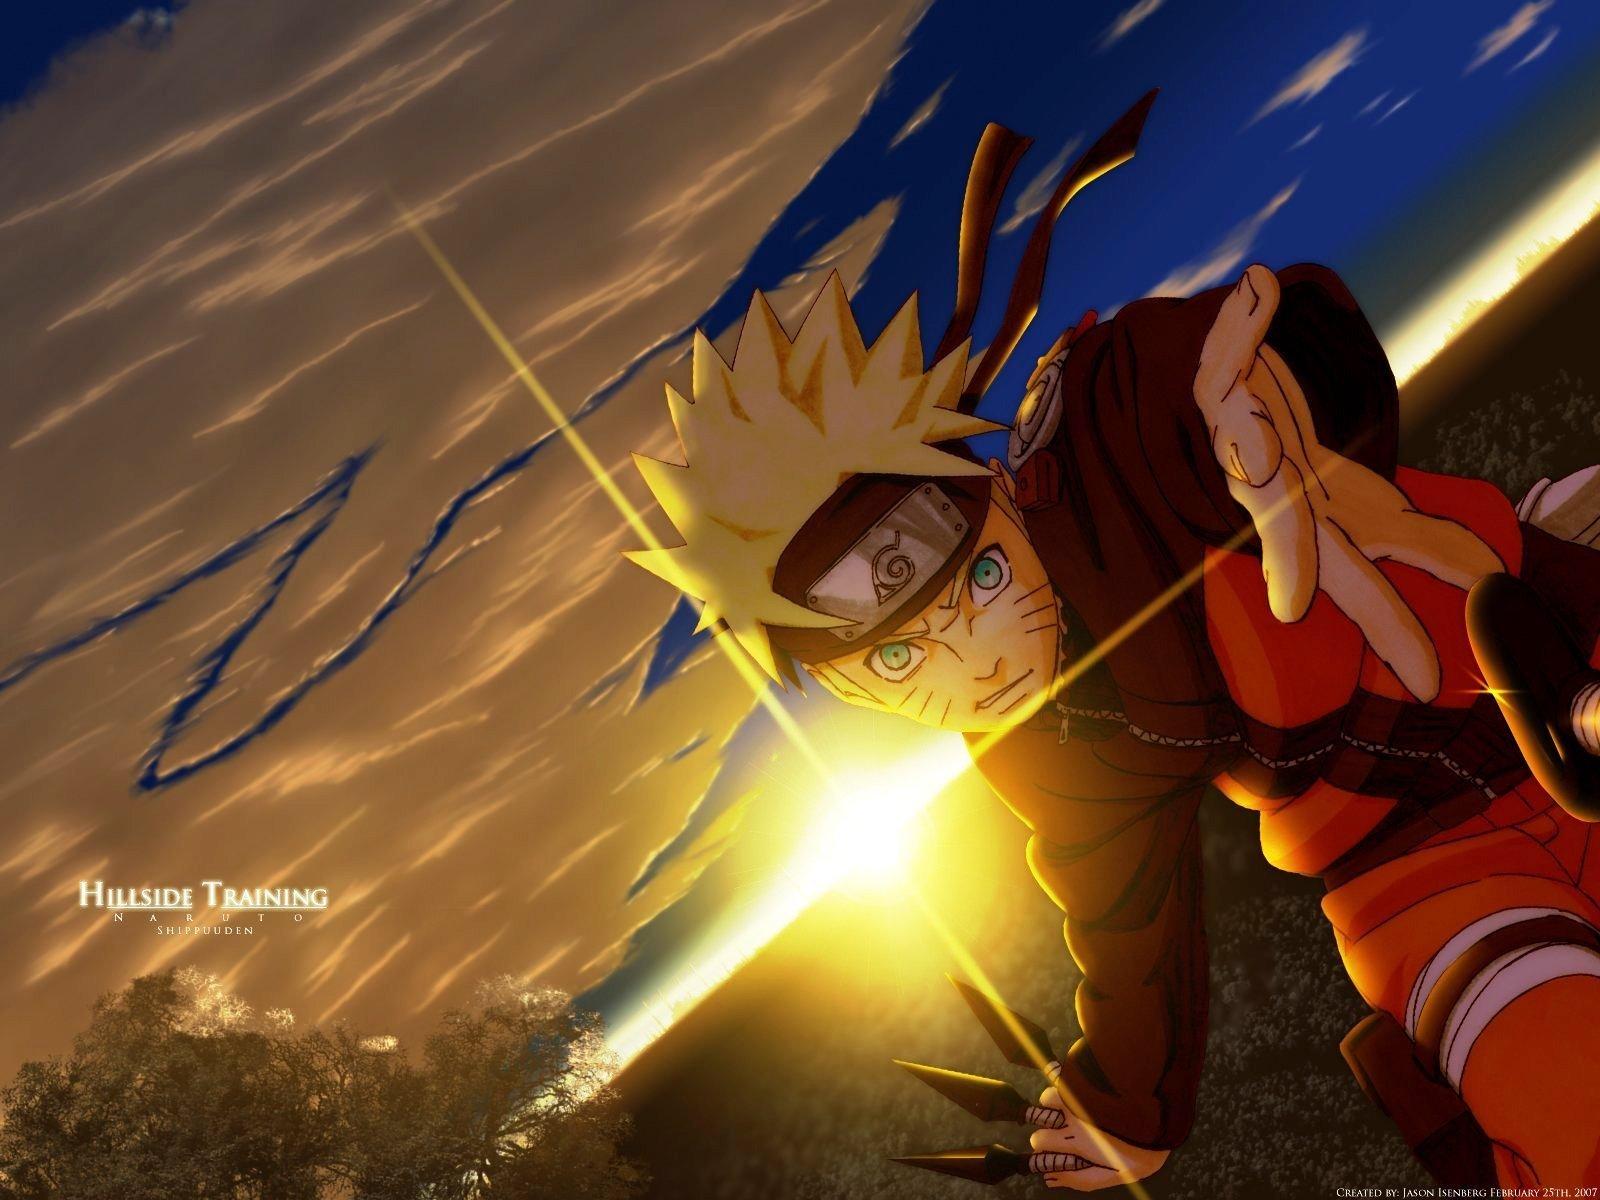 https://i1.wp.com/images2.fanpop.com/images/photos/3800000/Naruto-Shippuuden-naruto-shippuuden-3841084-1600-1200.jpg